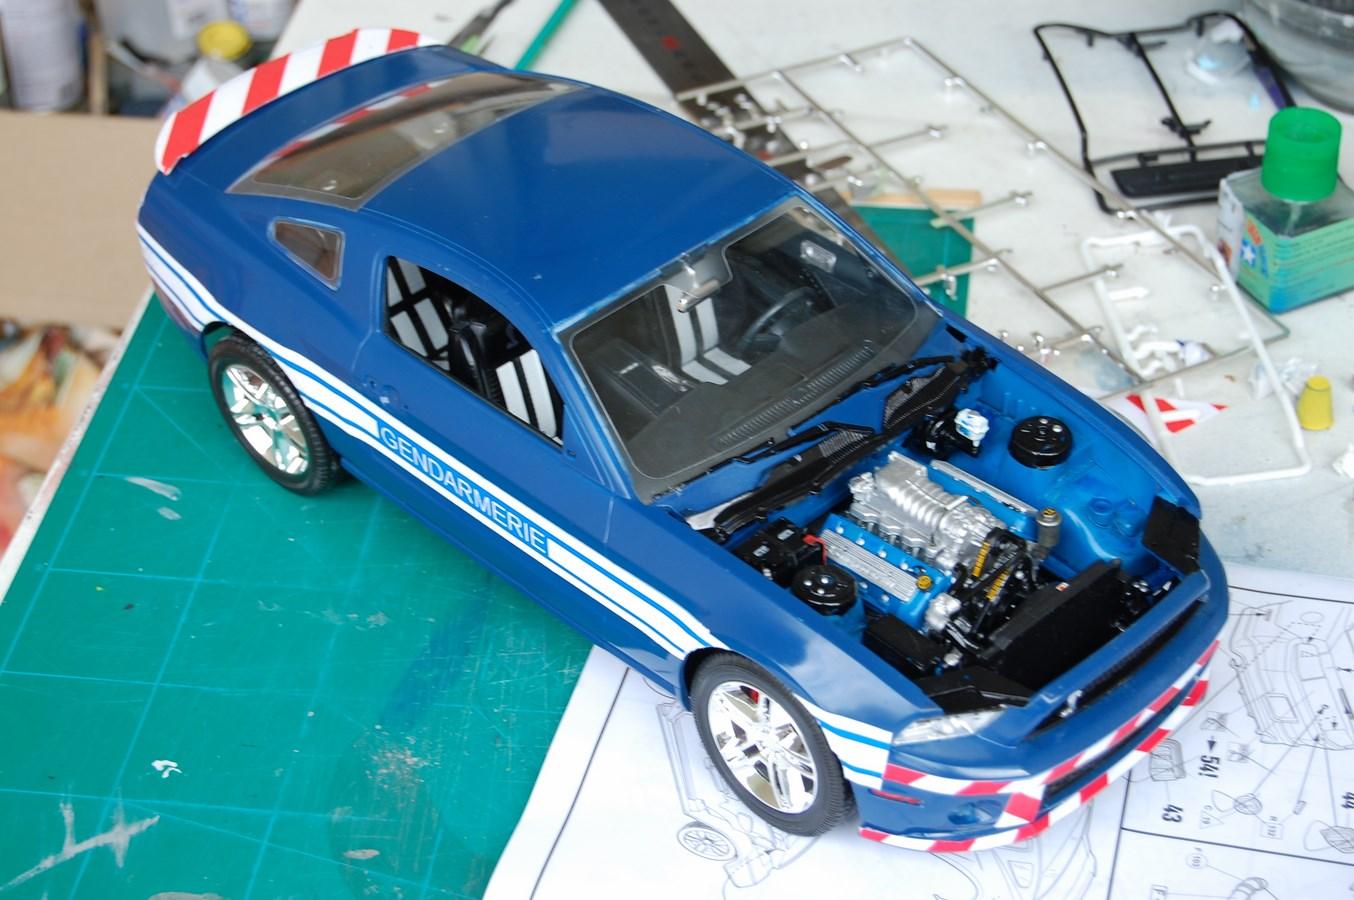 Shelby GT 500 version imaginaire Gendarmerie - Page 2 927747Mustang36Copier